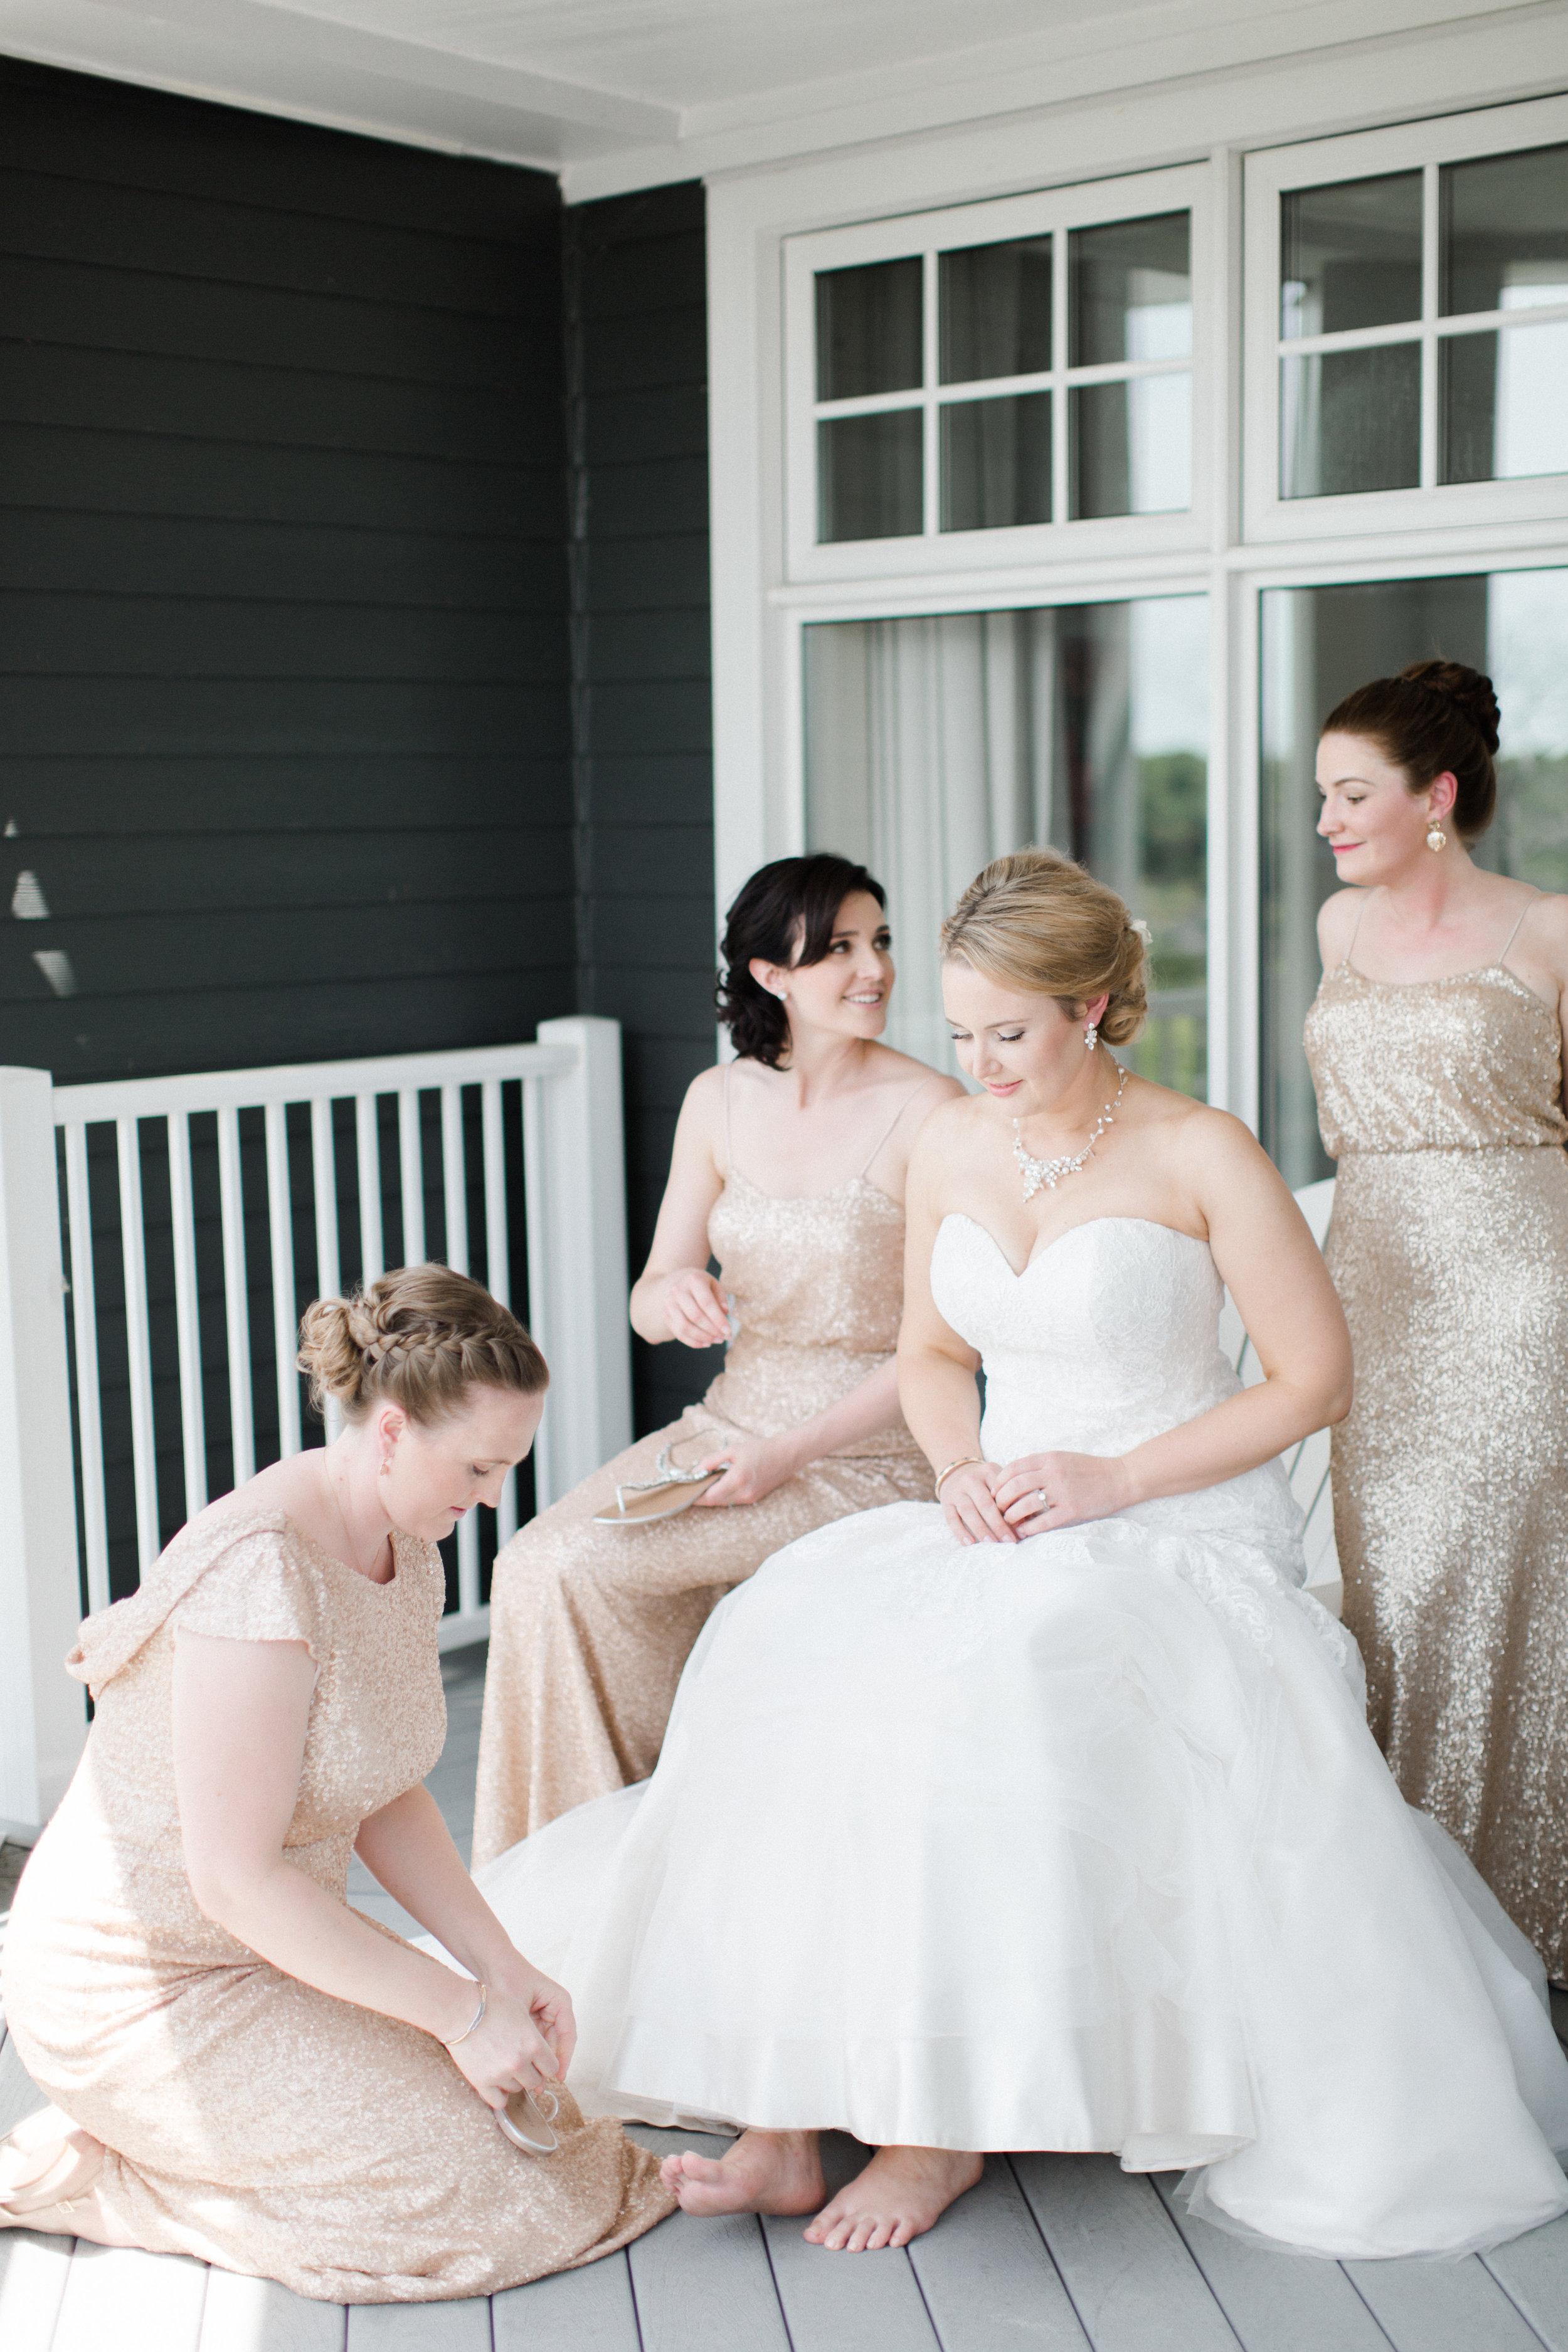 toronto-ontario-muskoka-rosseau-marriott-high-end-wedding-photographer-richelle-hunter-tori-doug-187.jpg